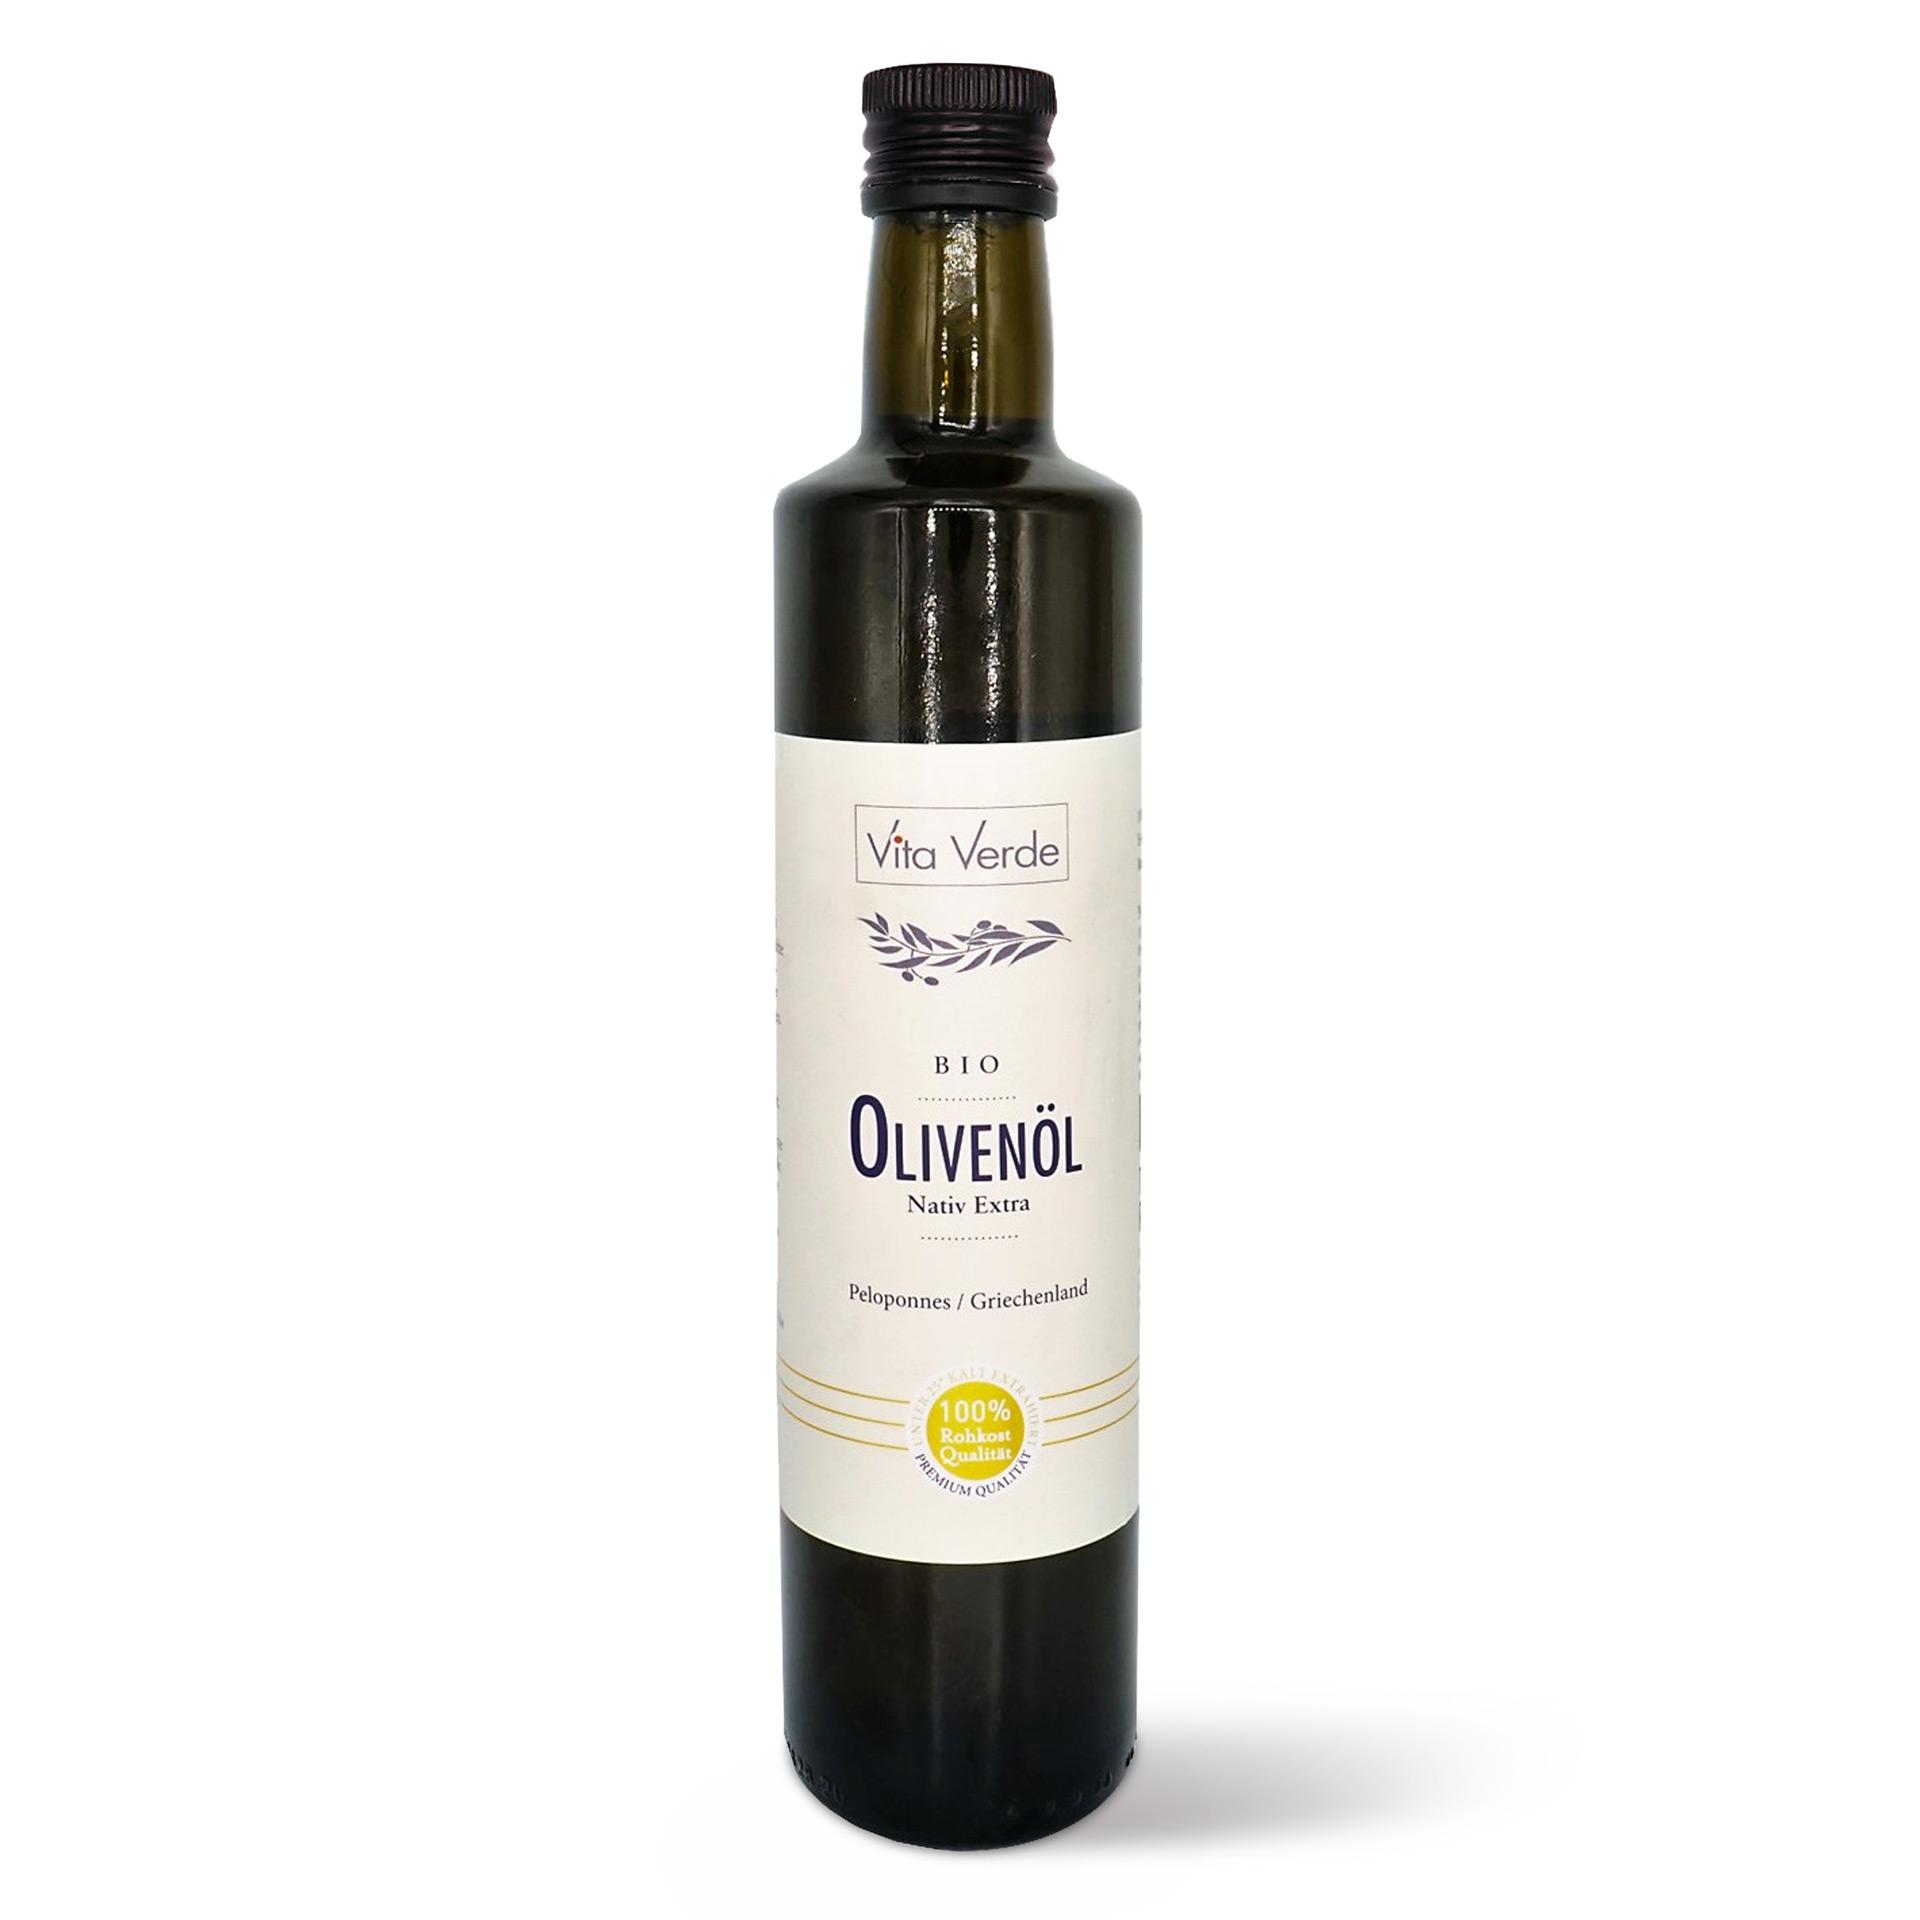 Vita Verde BIO Olivenöl Peloponnes extra nativ in Rohkost Qualität